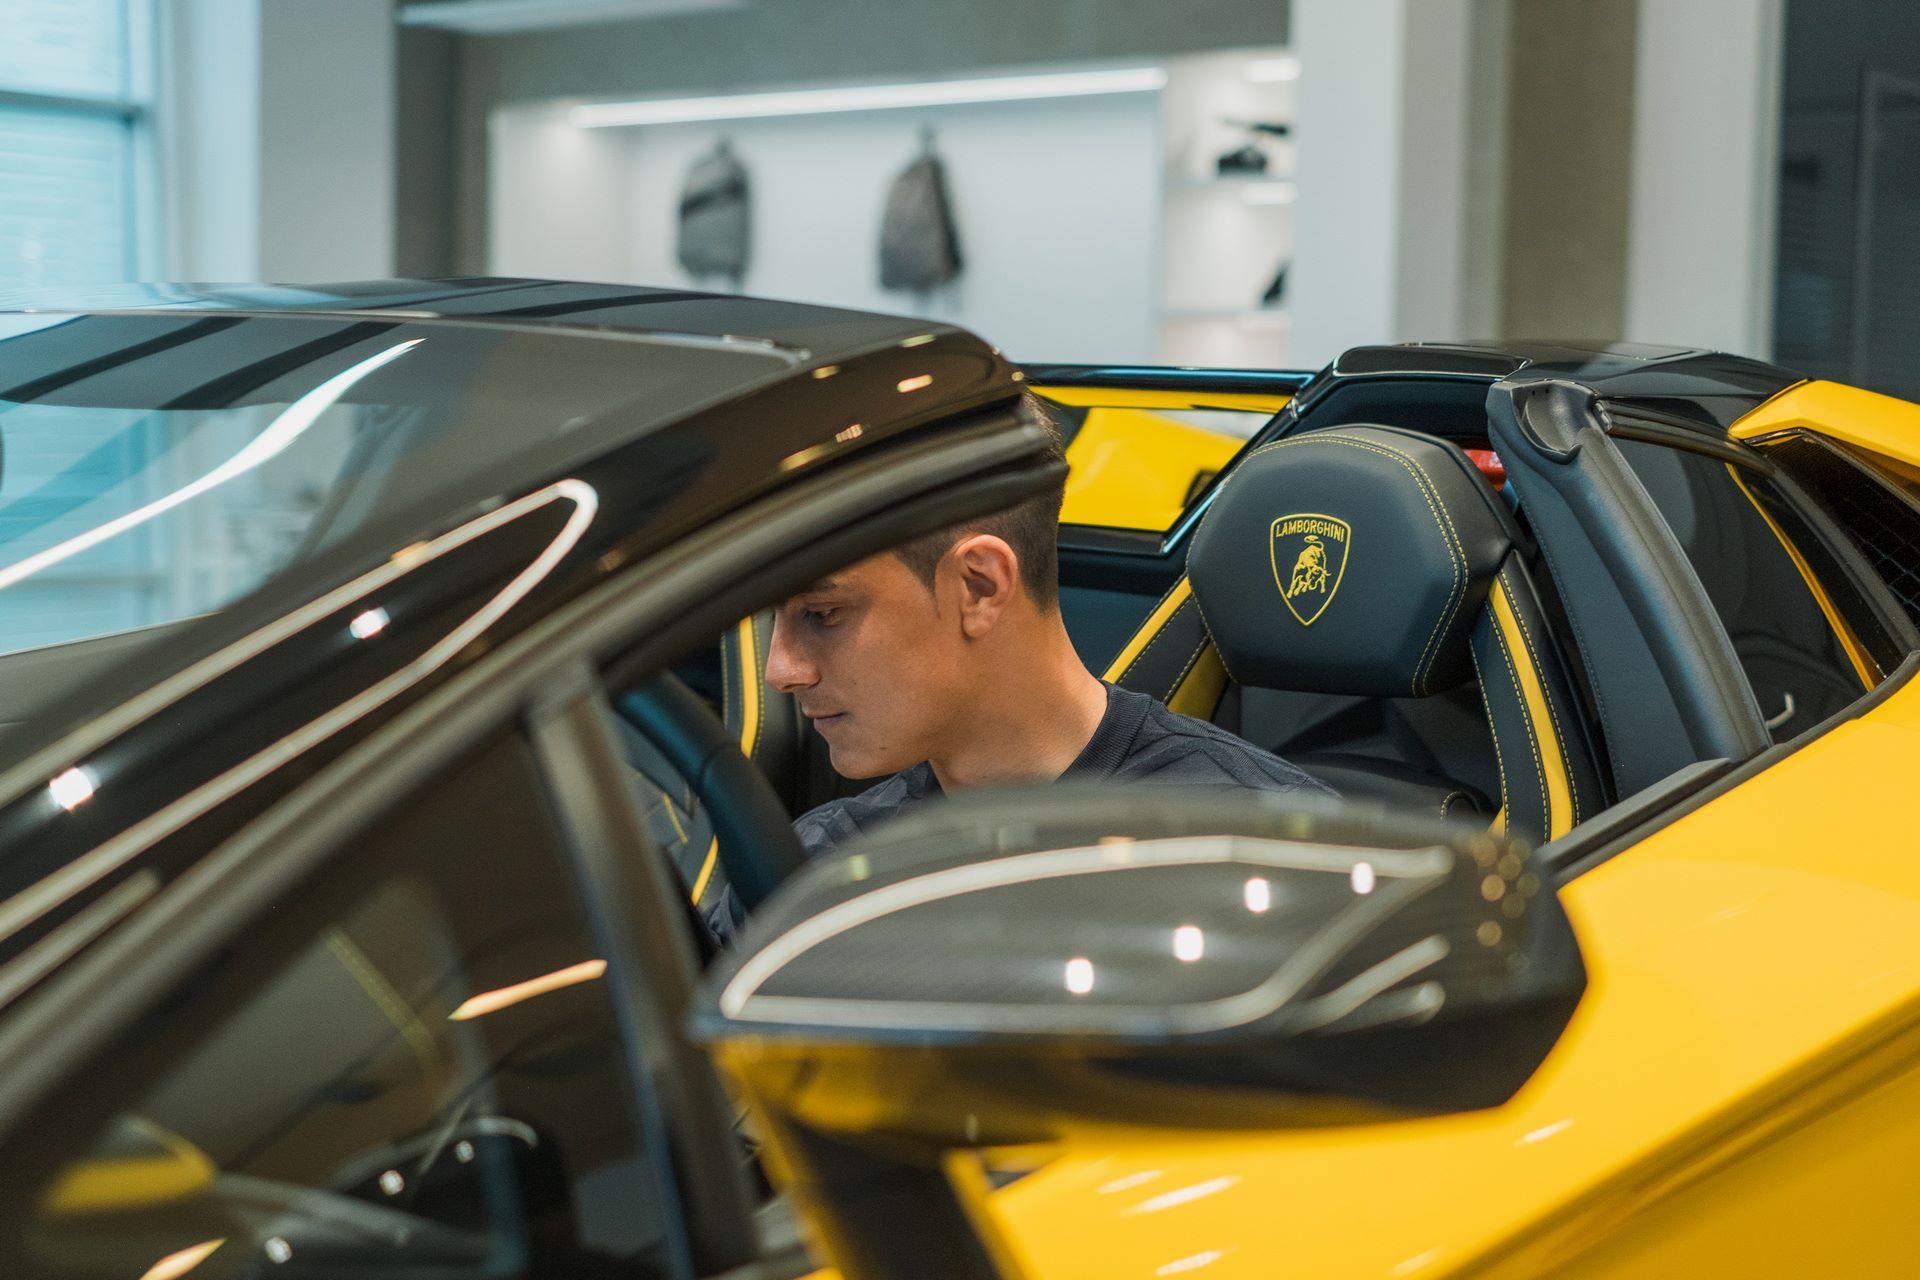 Paulo-Dybala-Lamborghini-Aventador-S-Roadster-3